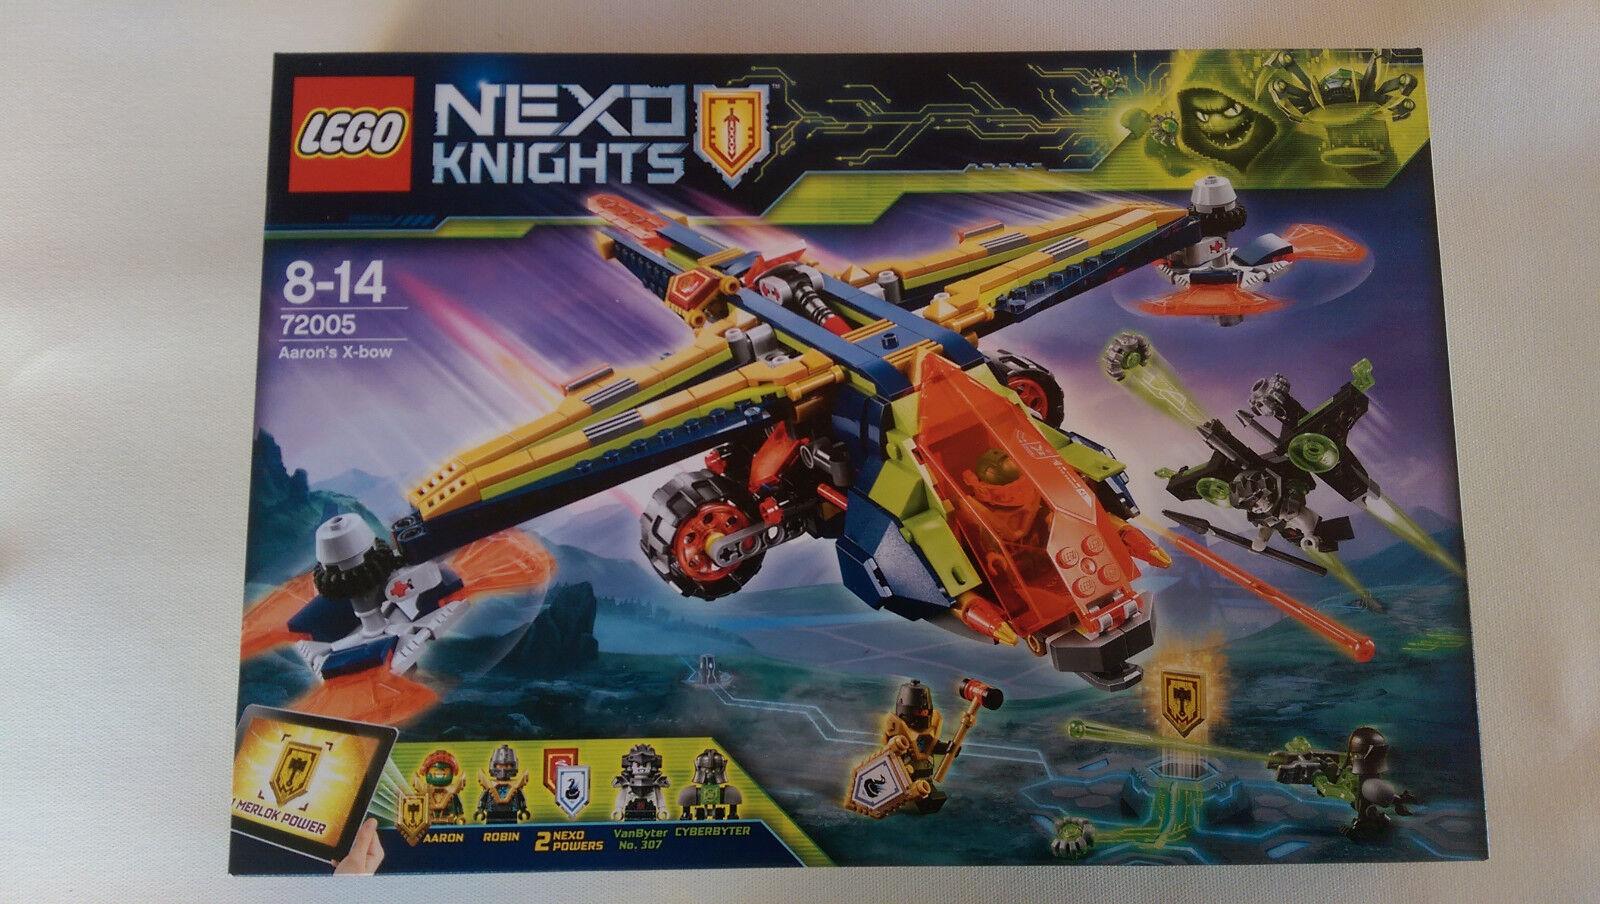 Lego Nexo Knights - 72005 - L'avion-arbalète d'Aaron - NEUF Scellé